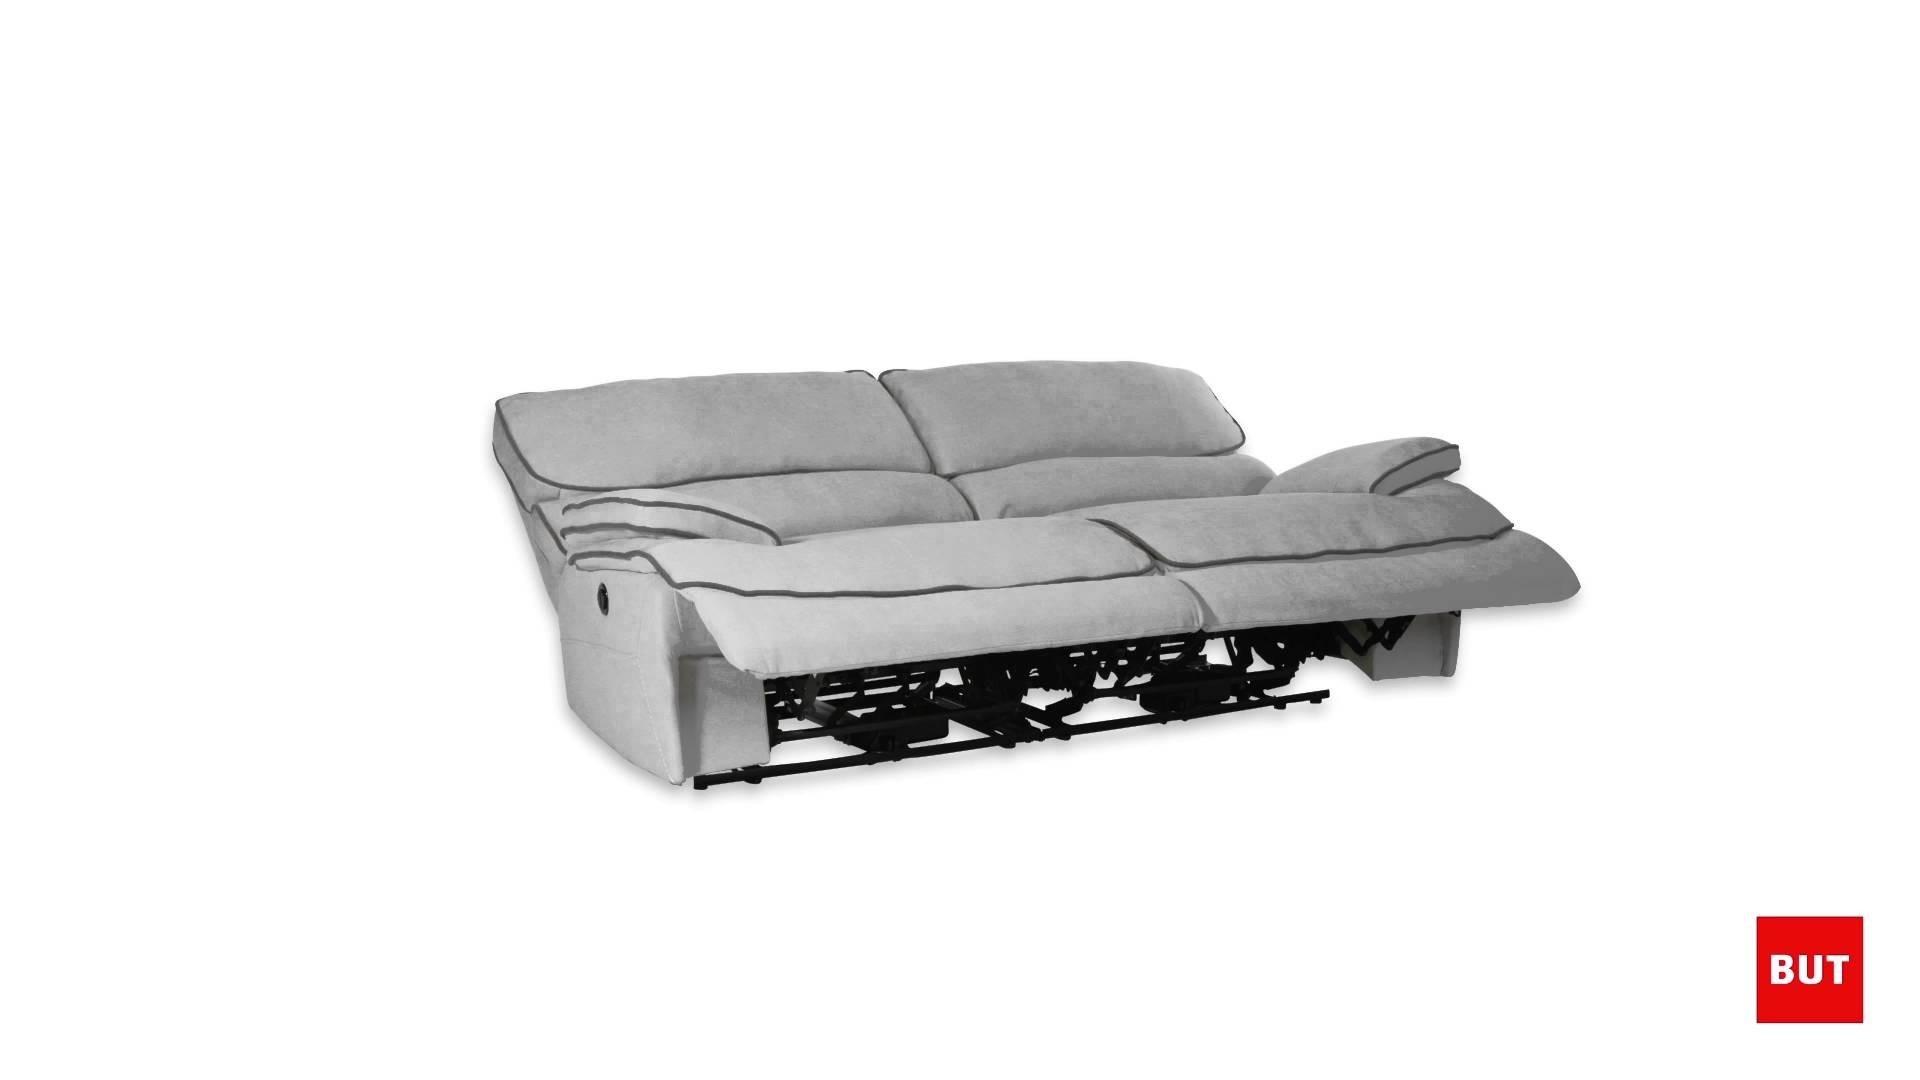 Canapé D Angle Ikea Convertible Impressionnant Images Lit Armoire Canapé Beautiful Canap En U Convertible 12 Full Canape D